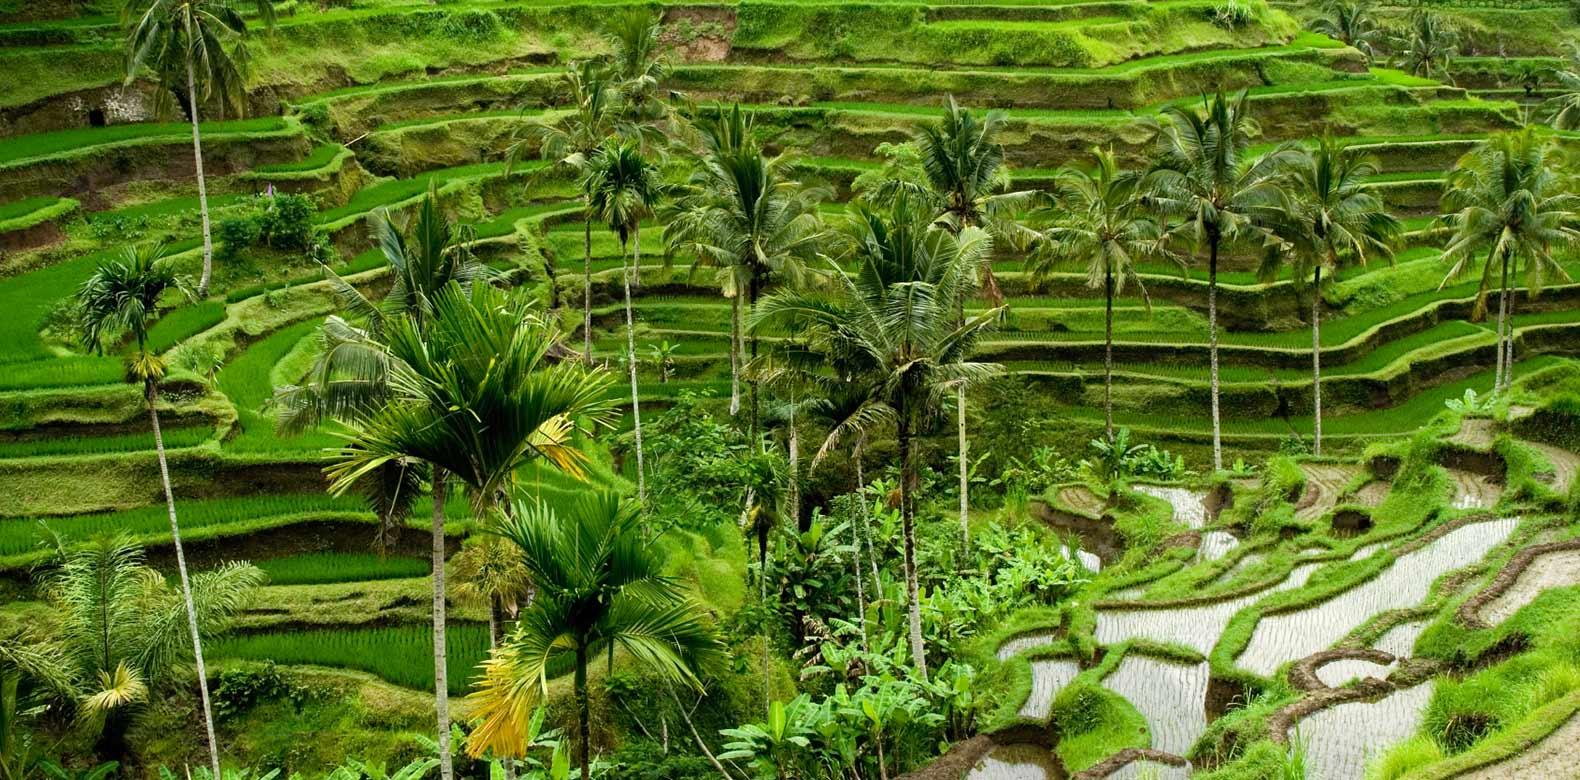 tegalalang pirinç tarlası